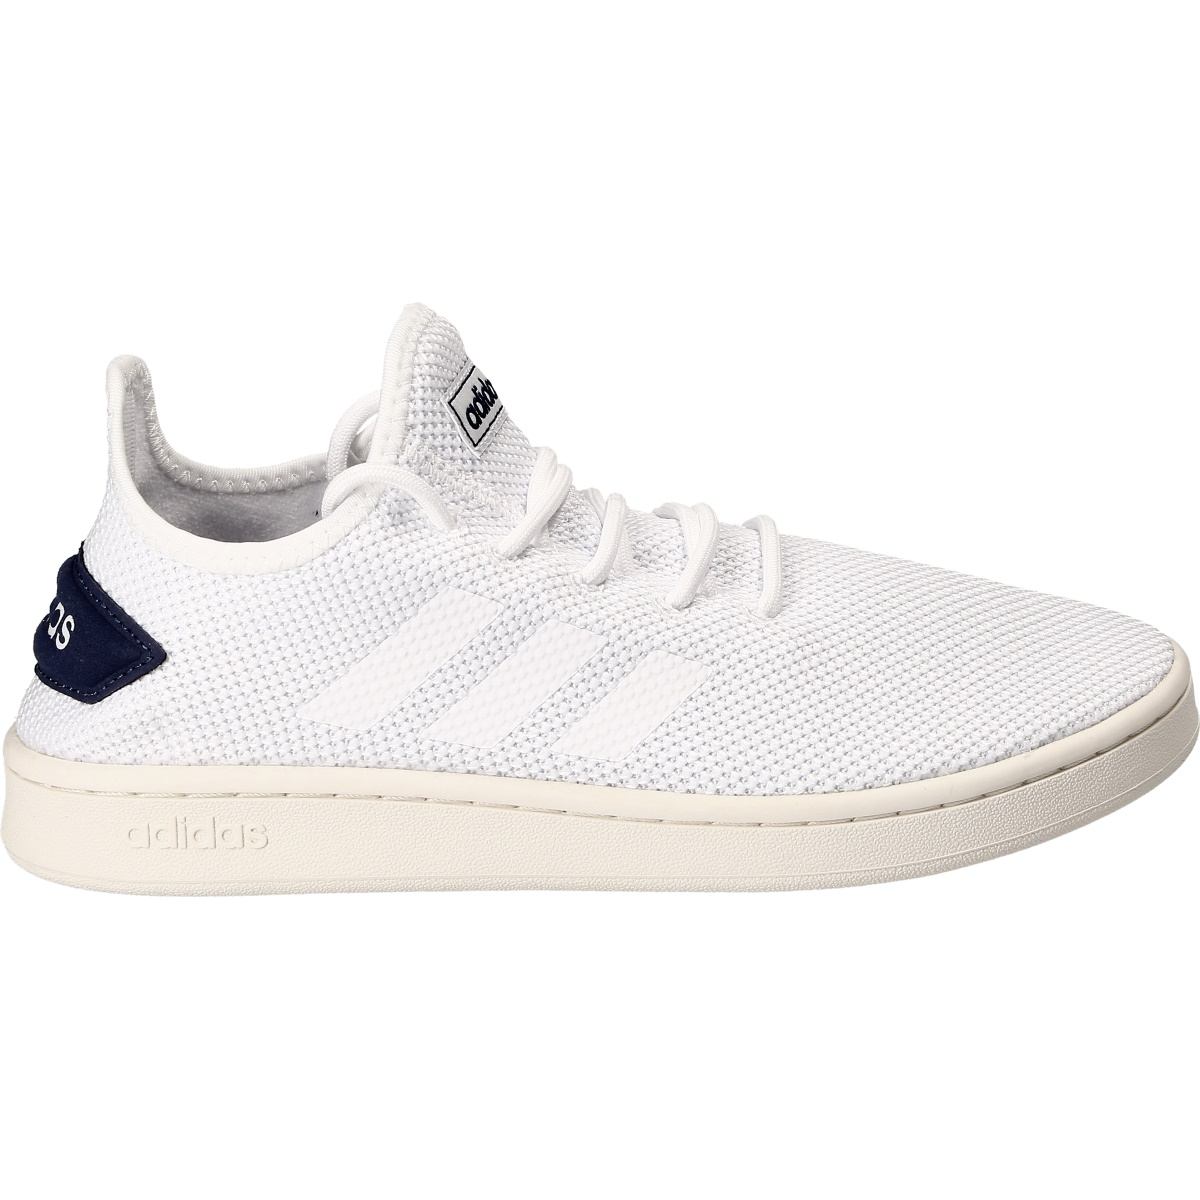 Details about adidas Men's Court Adapt Sneaker